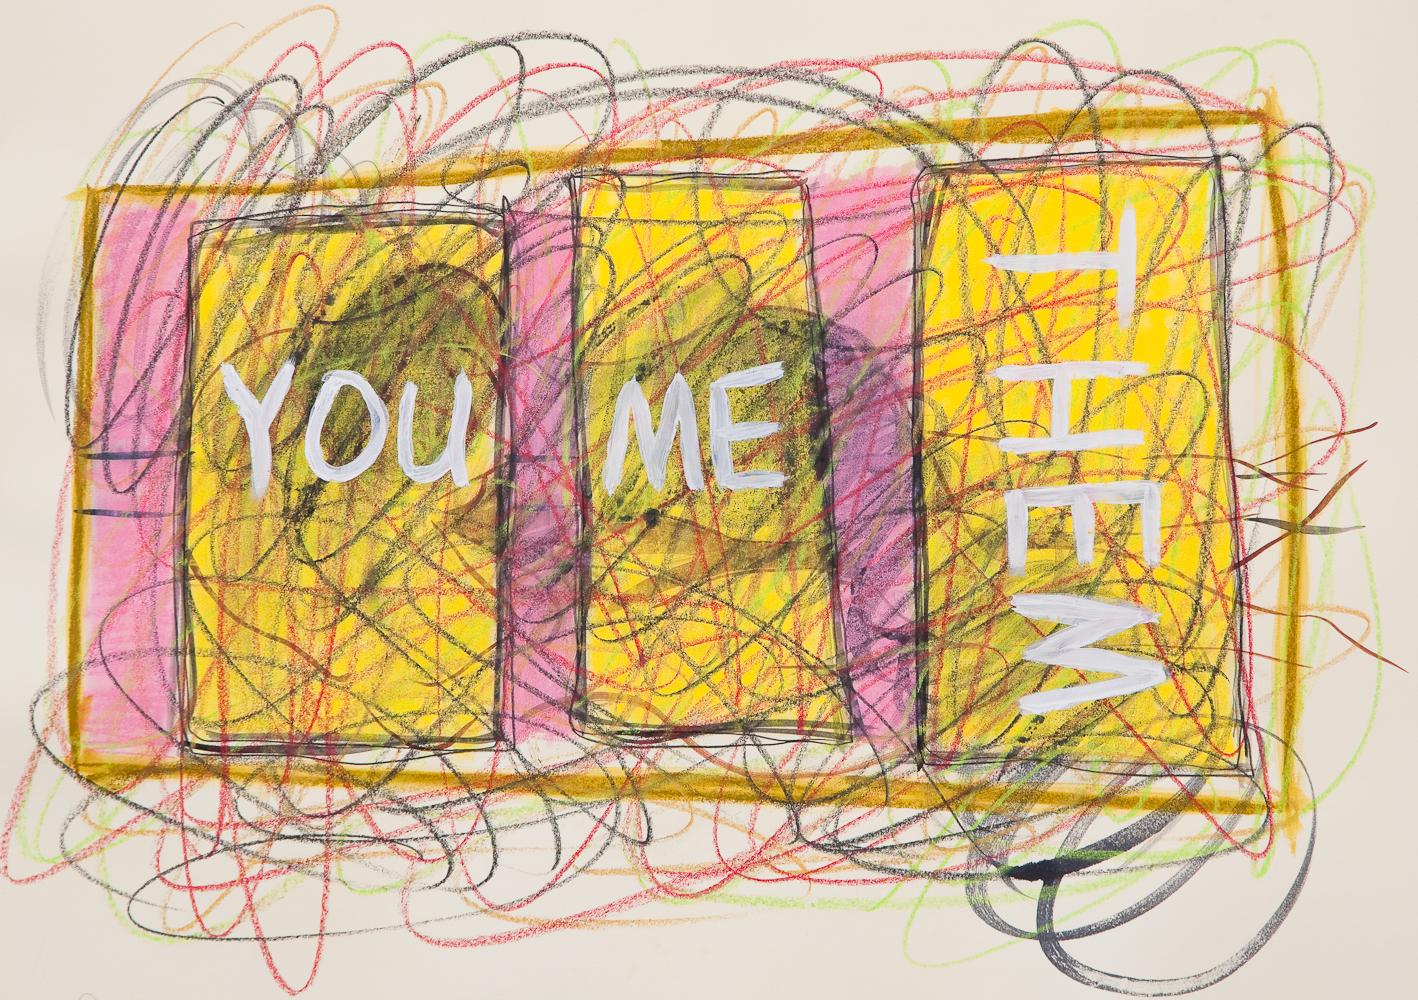 You, Me, Them